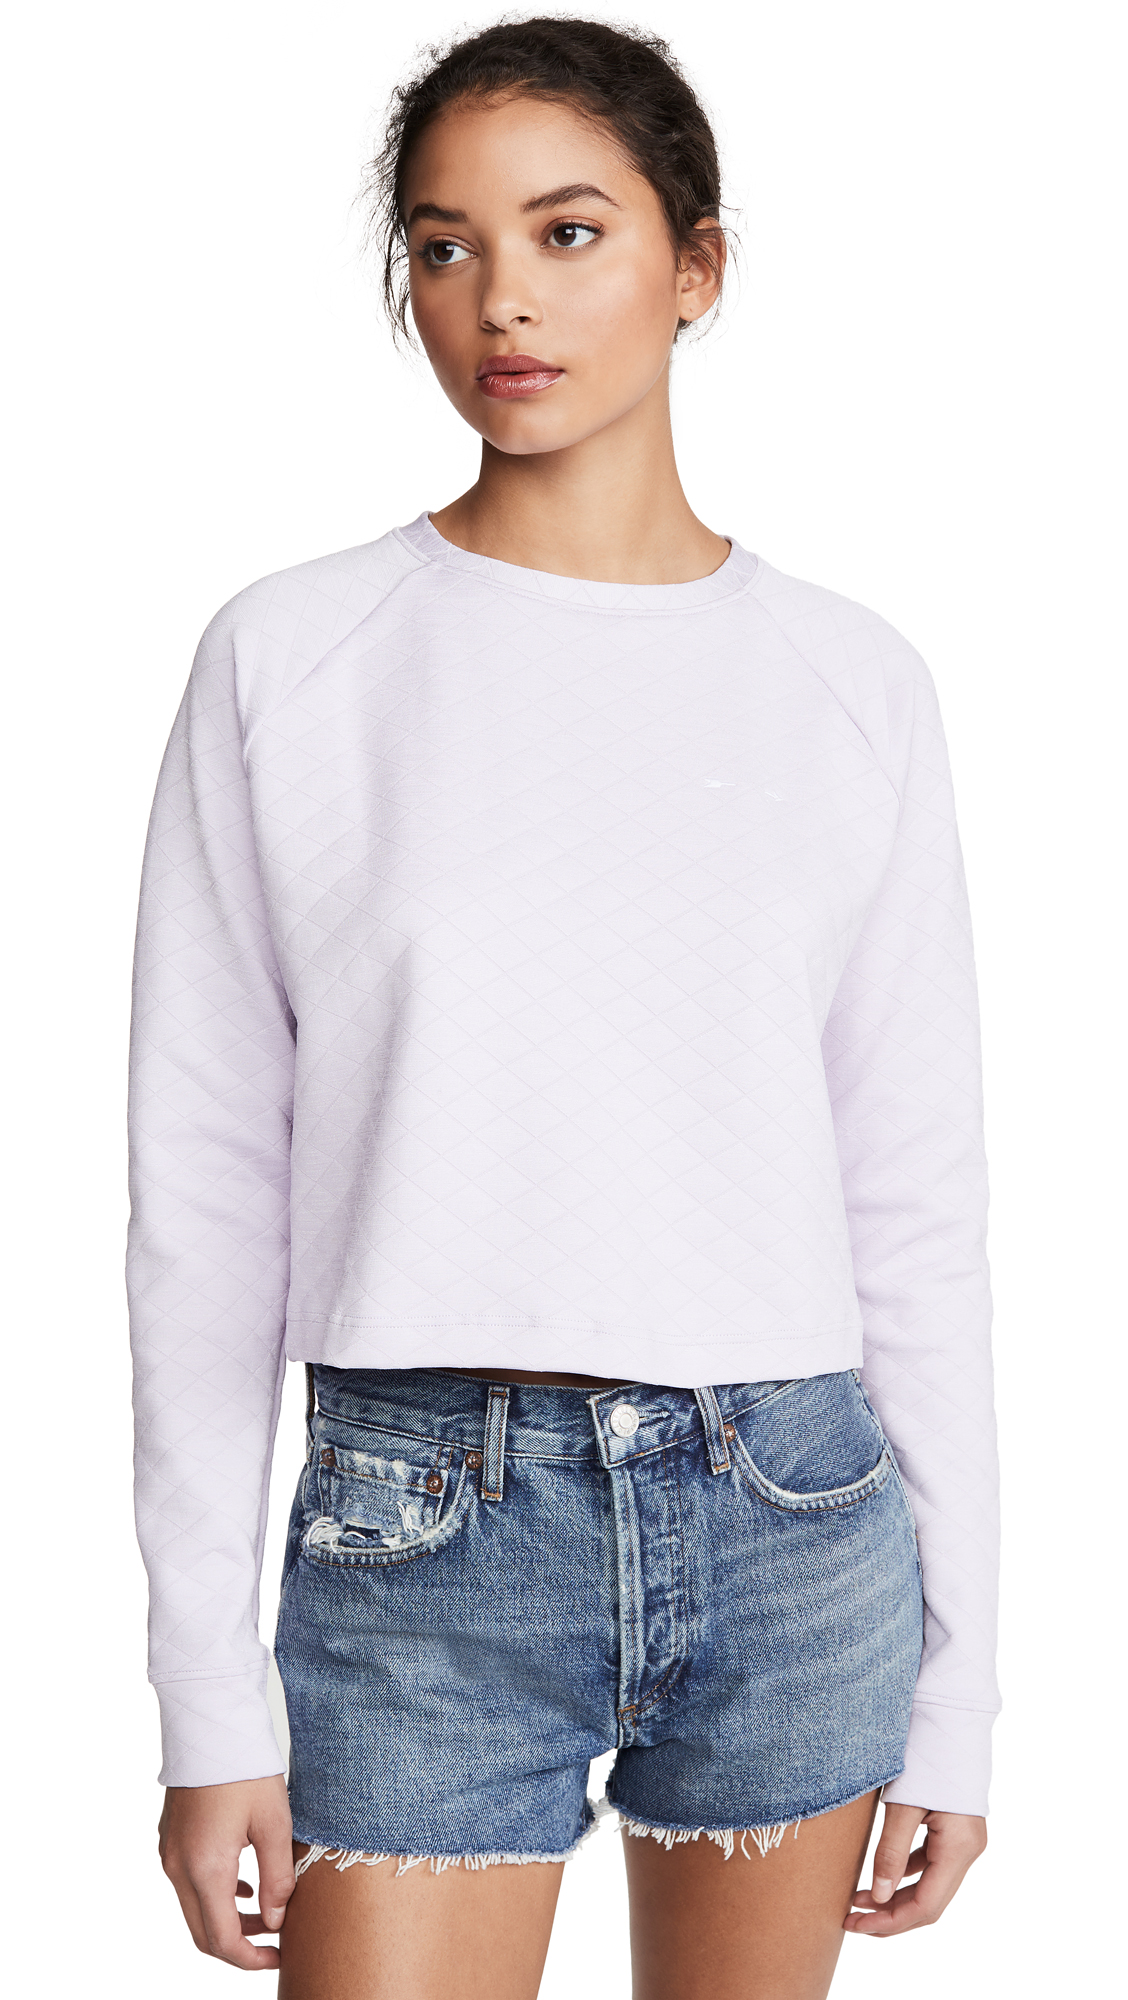 The Upside Faith Crop Crew Sweatshirt - 30% Off Sale